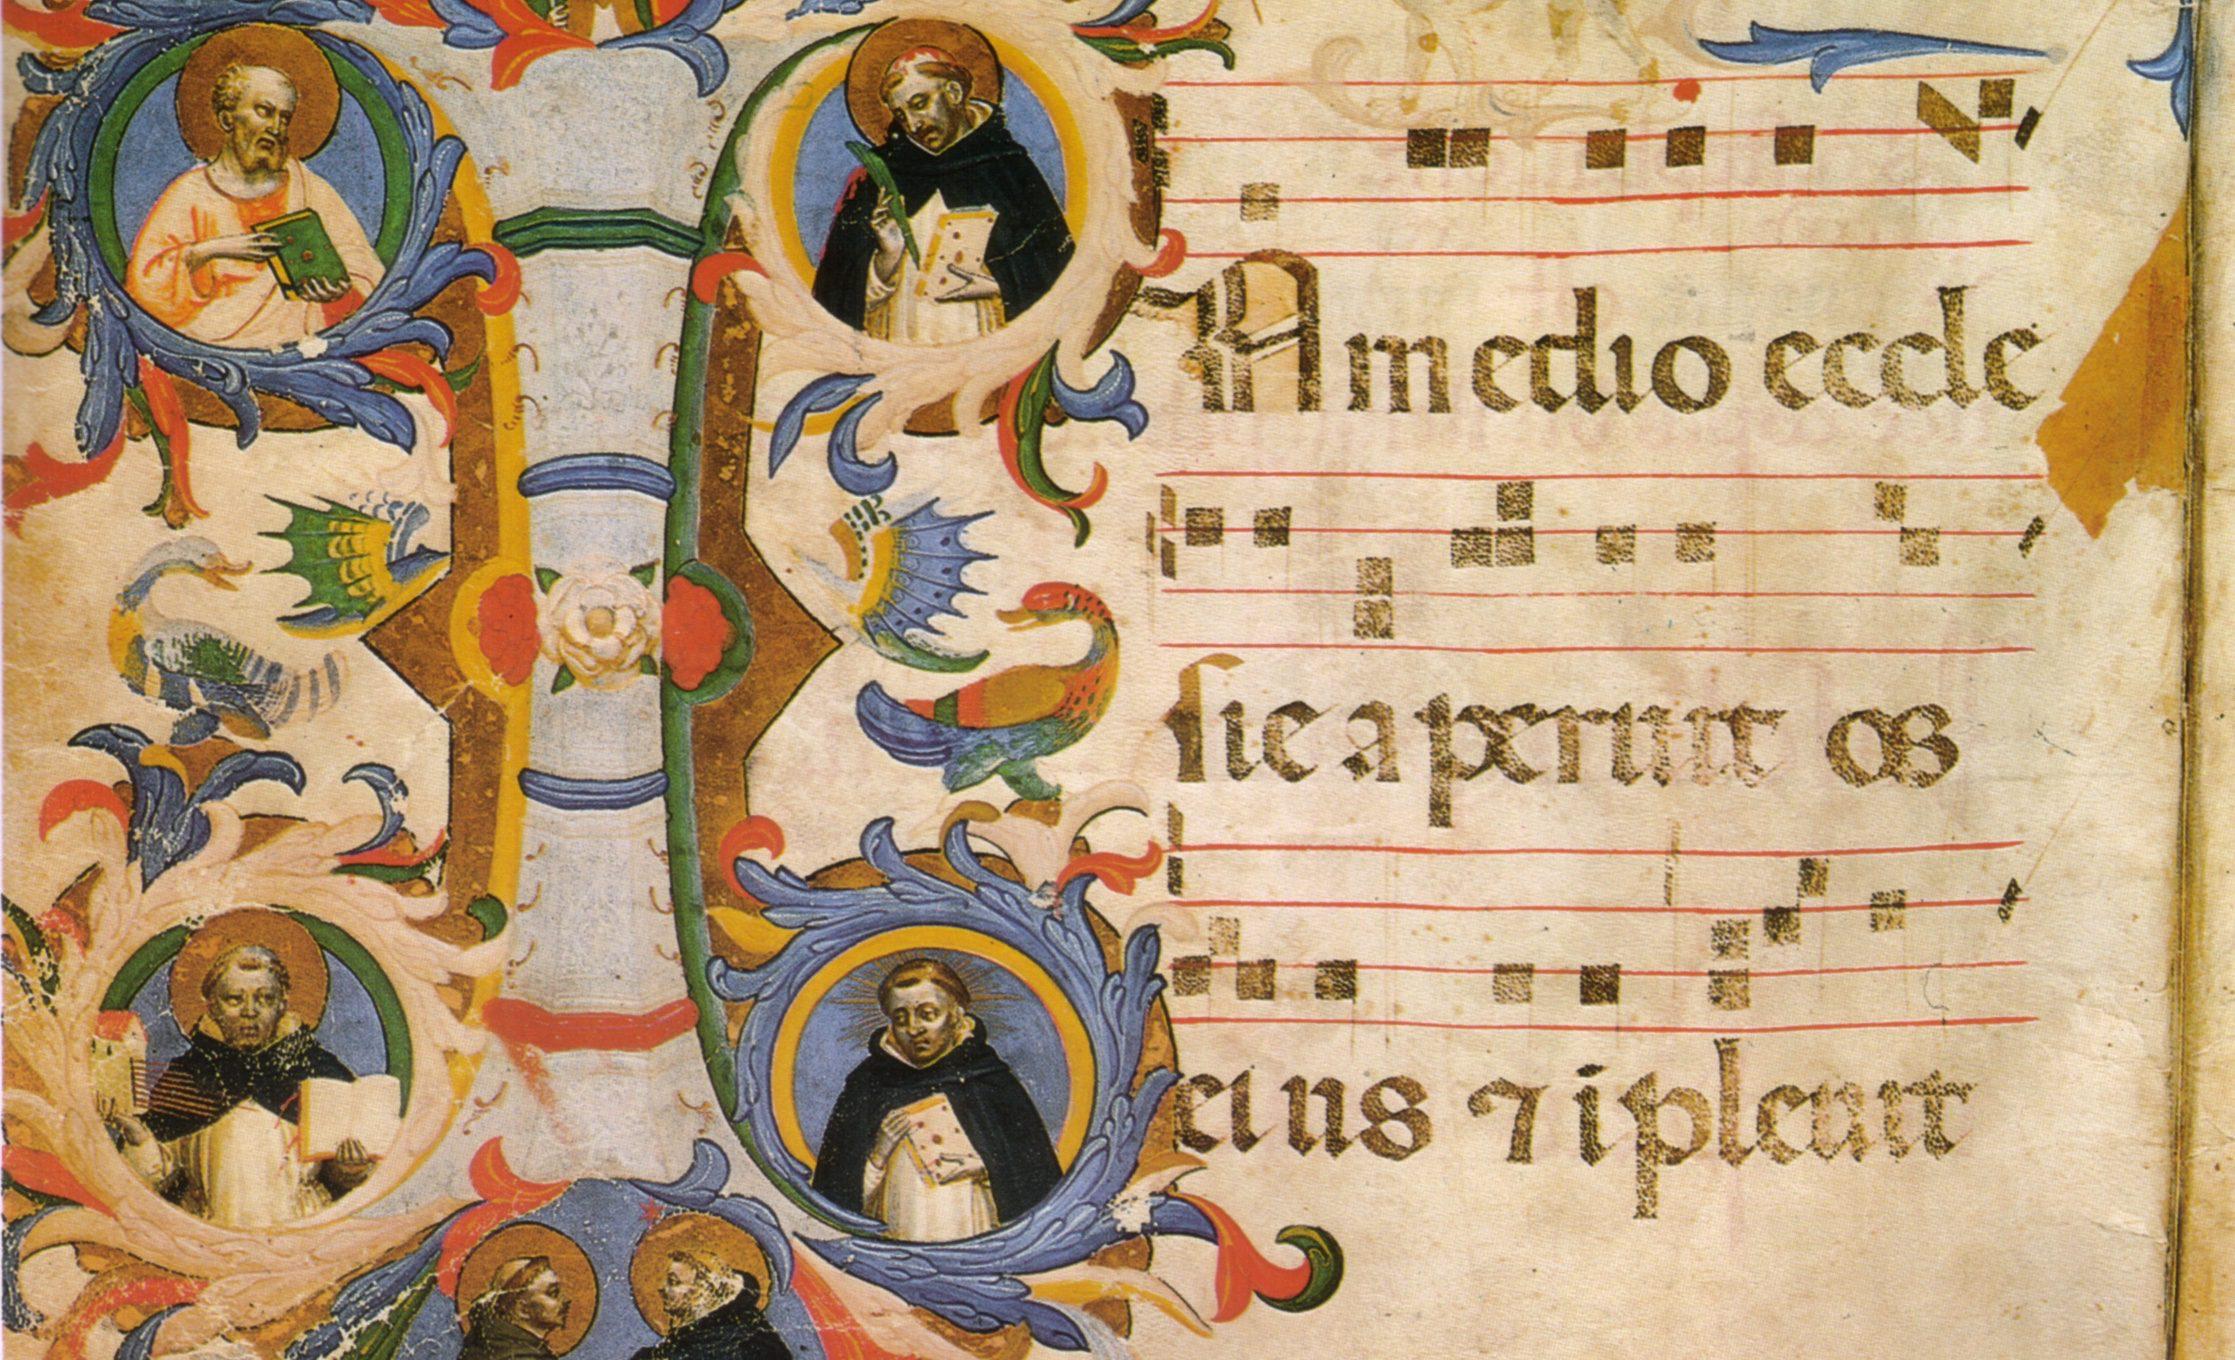 A Hymn to Saint Jude